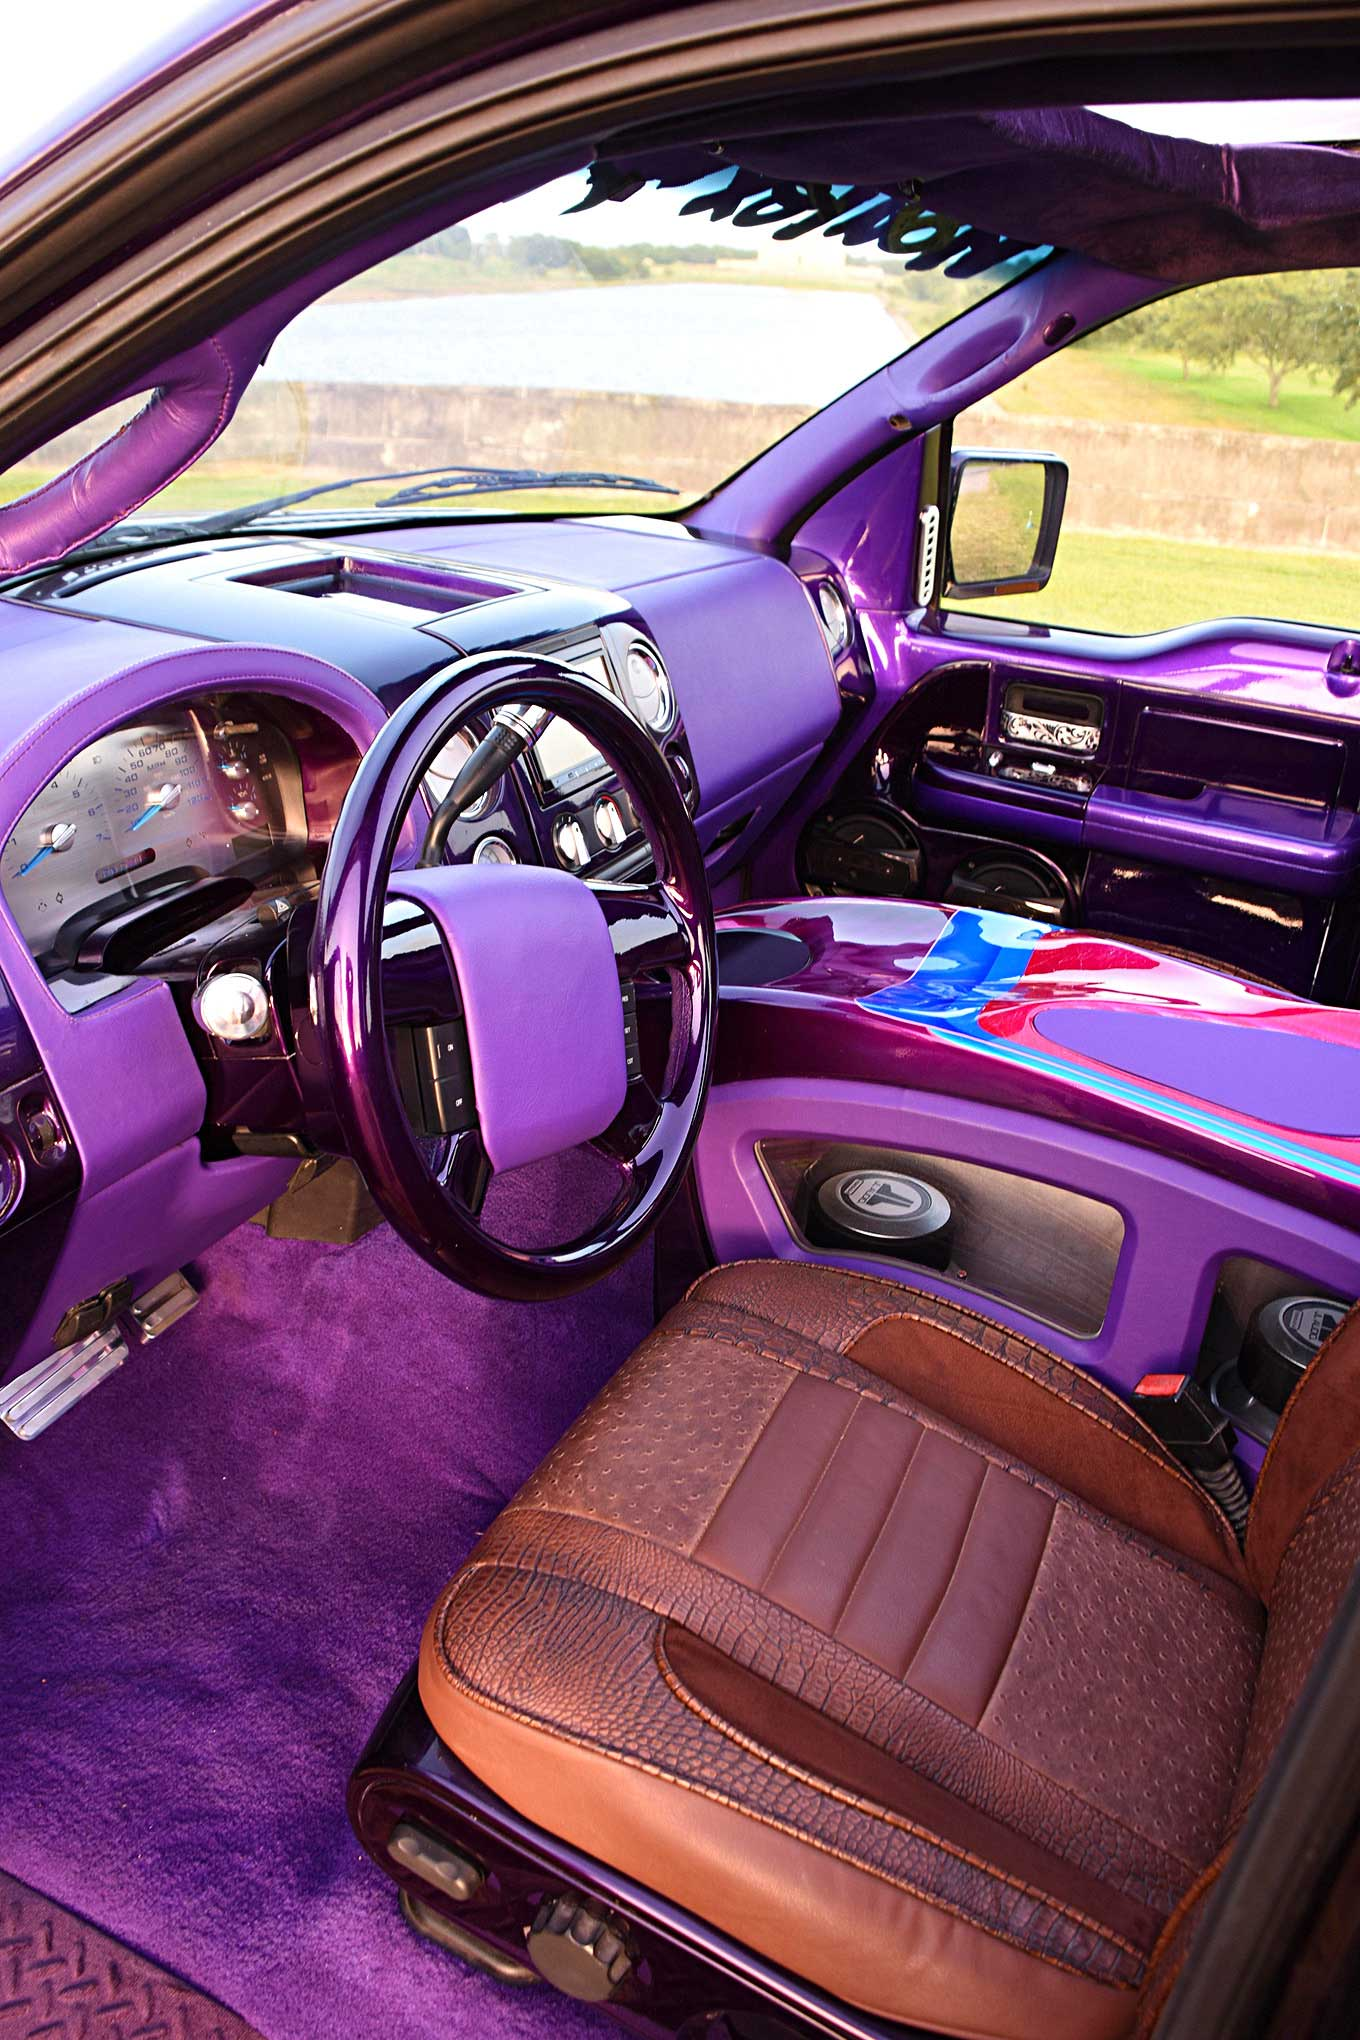 Wild West Cars And Trucks >> 2006 Ford F150 Custom Interior - Lowrider